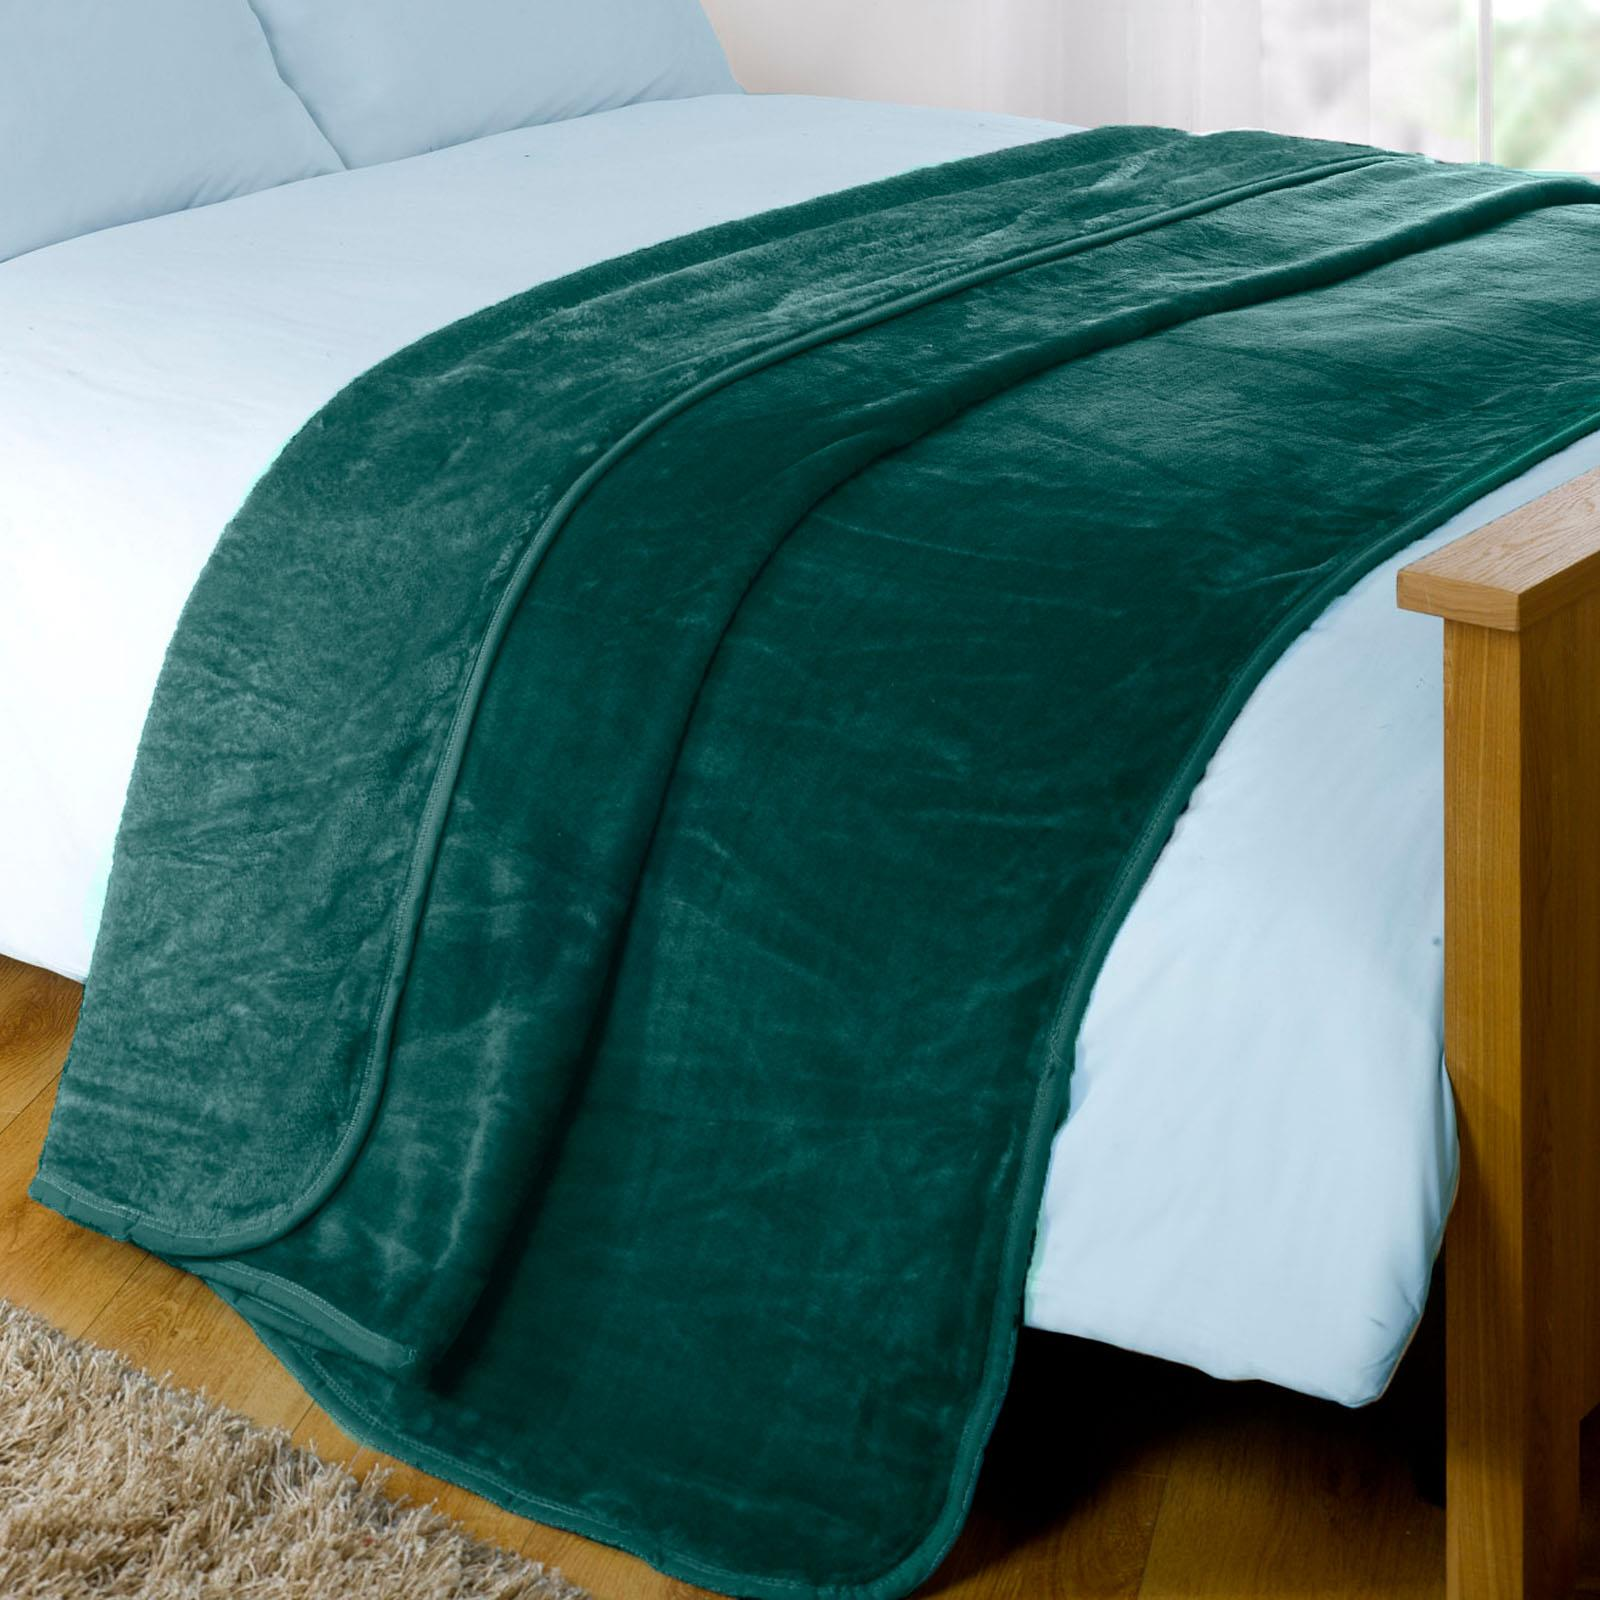 thumbnail 9 - Dreamscene Large Luxury Faux Fur Throw Sofa Bed Mink Soft Warm Fleece Blanket